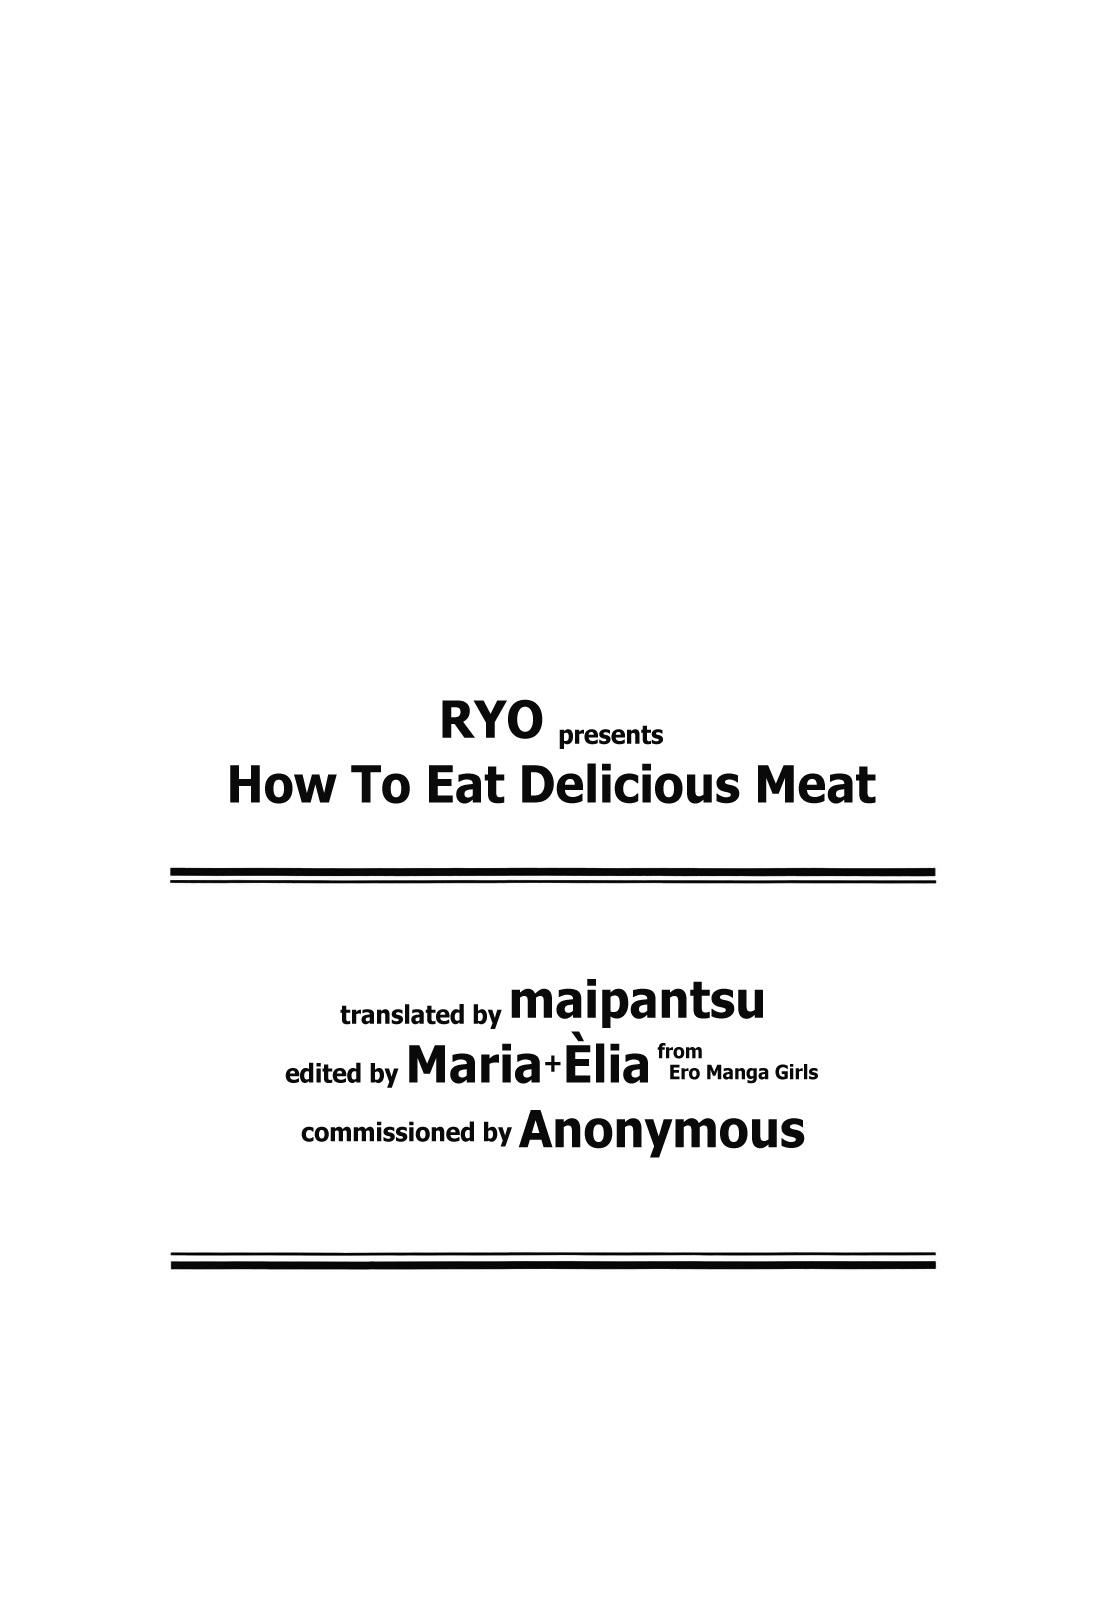 [Ryo] Oishii wo Niku no Meshiagari-kata   How To Eat Delicious Meat Ch. 1-4 [English] =Anonymous+maipantsu+EroMangaGirls= 63